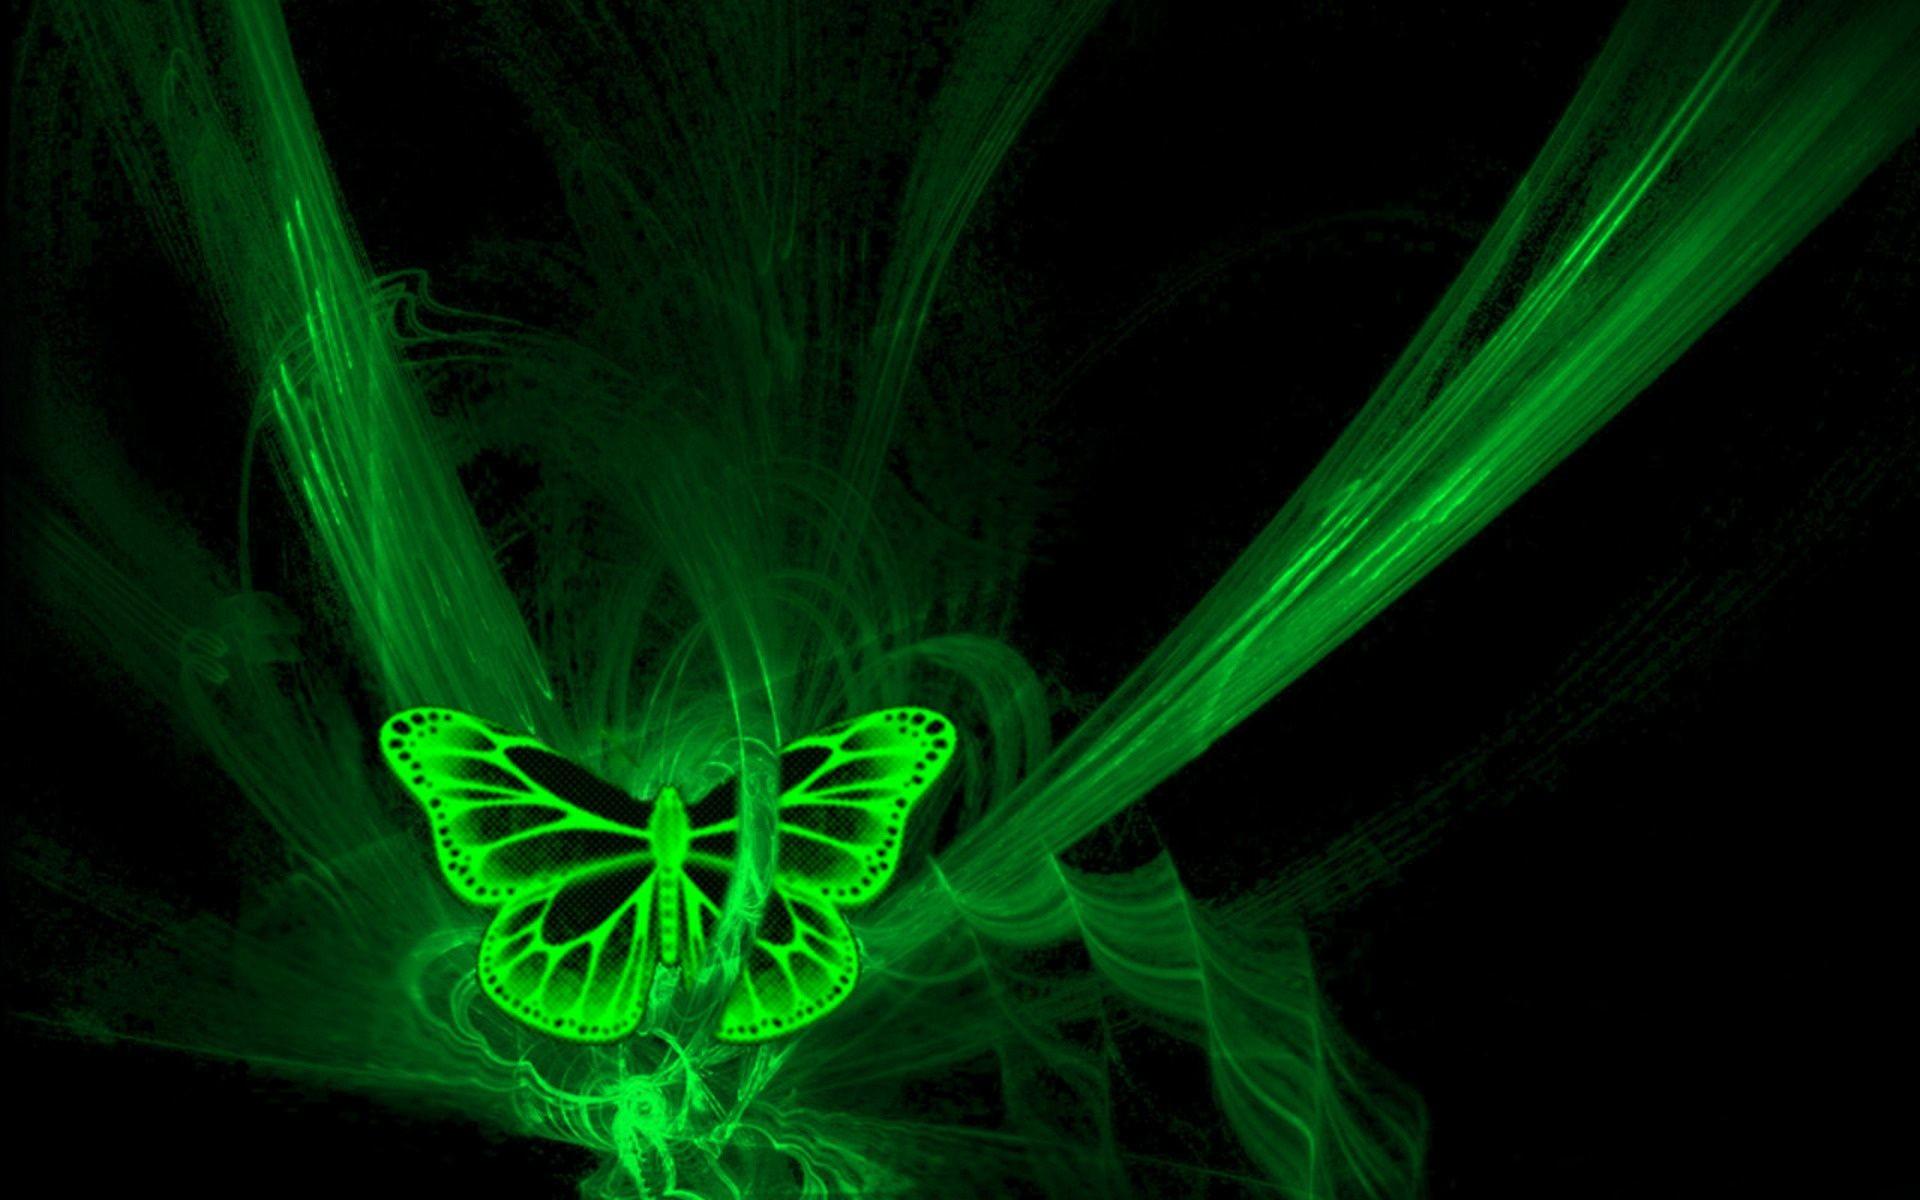 Green Neon Wallpapers HD.